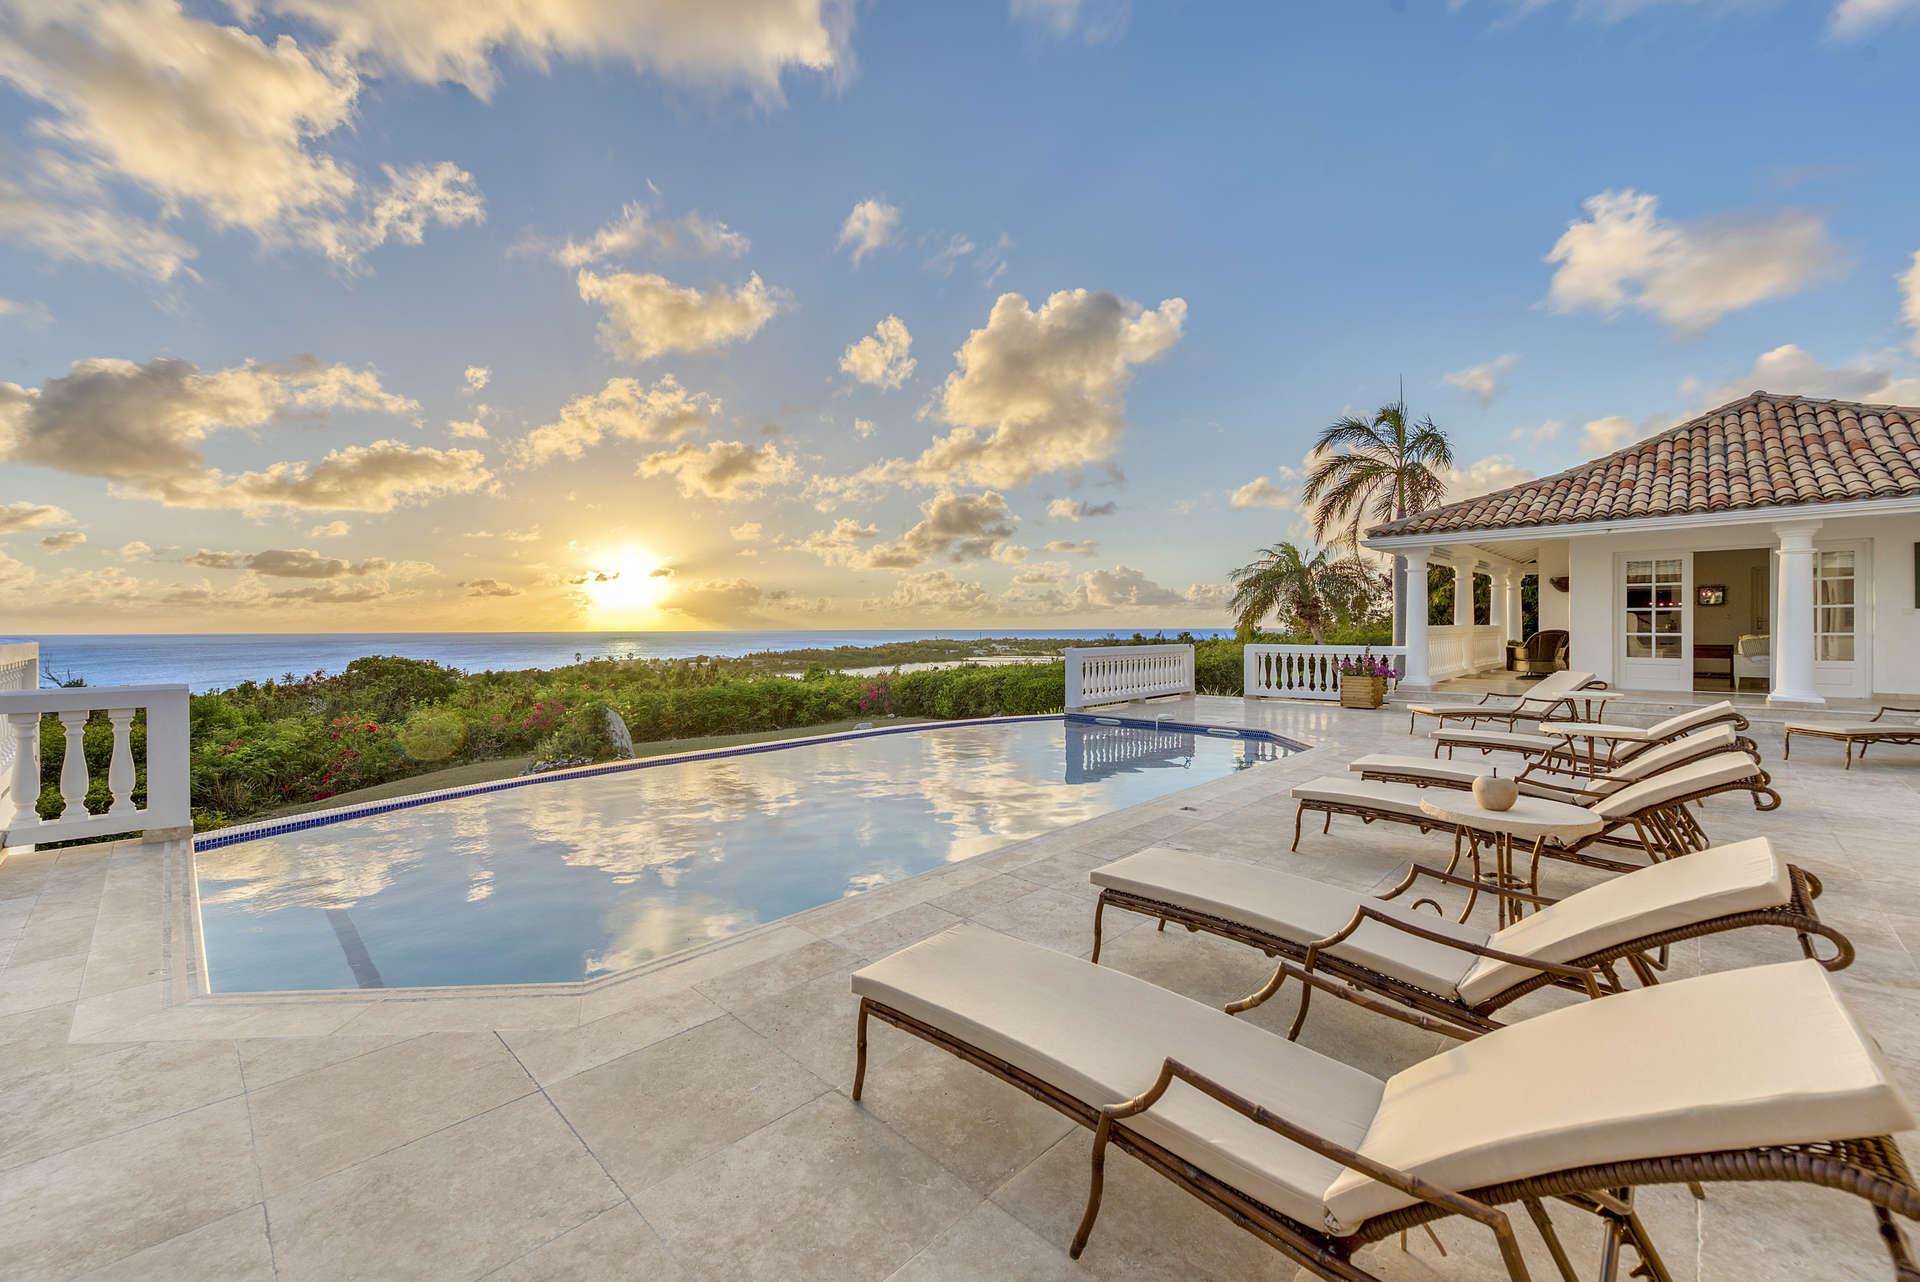 Luxury villa rentals caribbean - St martin - Saint martin french - Les terres basses - Mer Soleil - Image 1/28